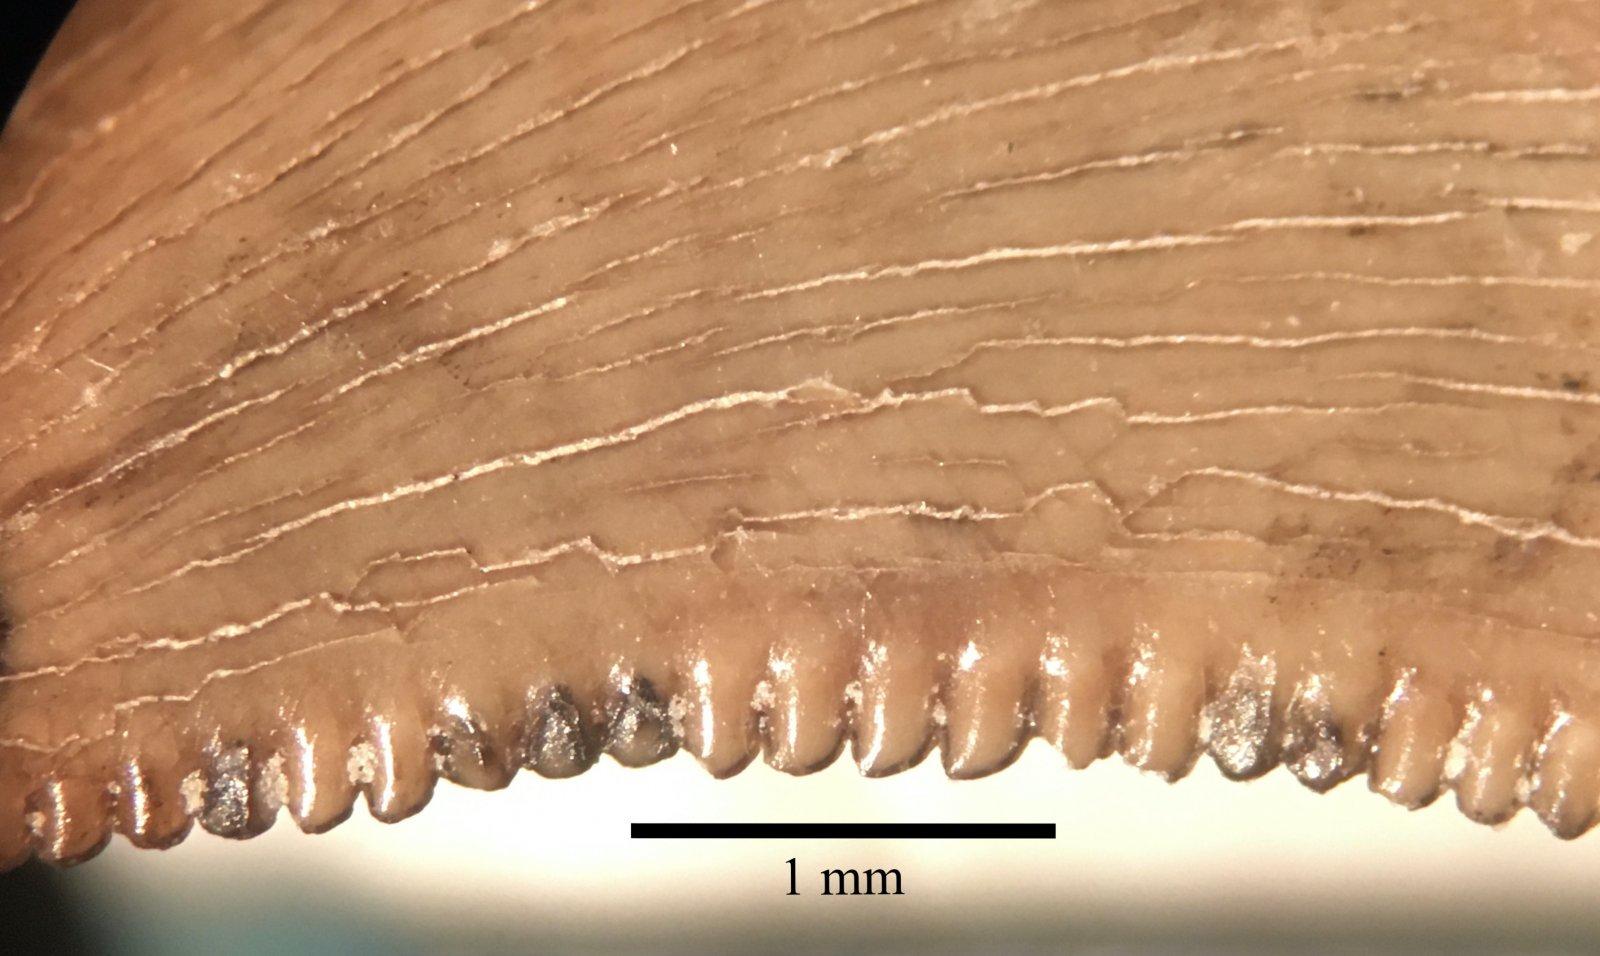 Saurornitholestes distal serrations